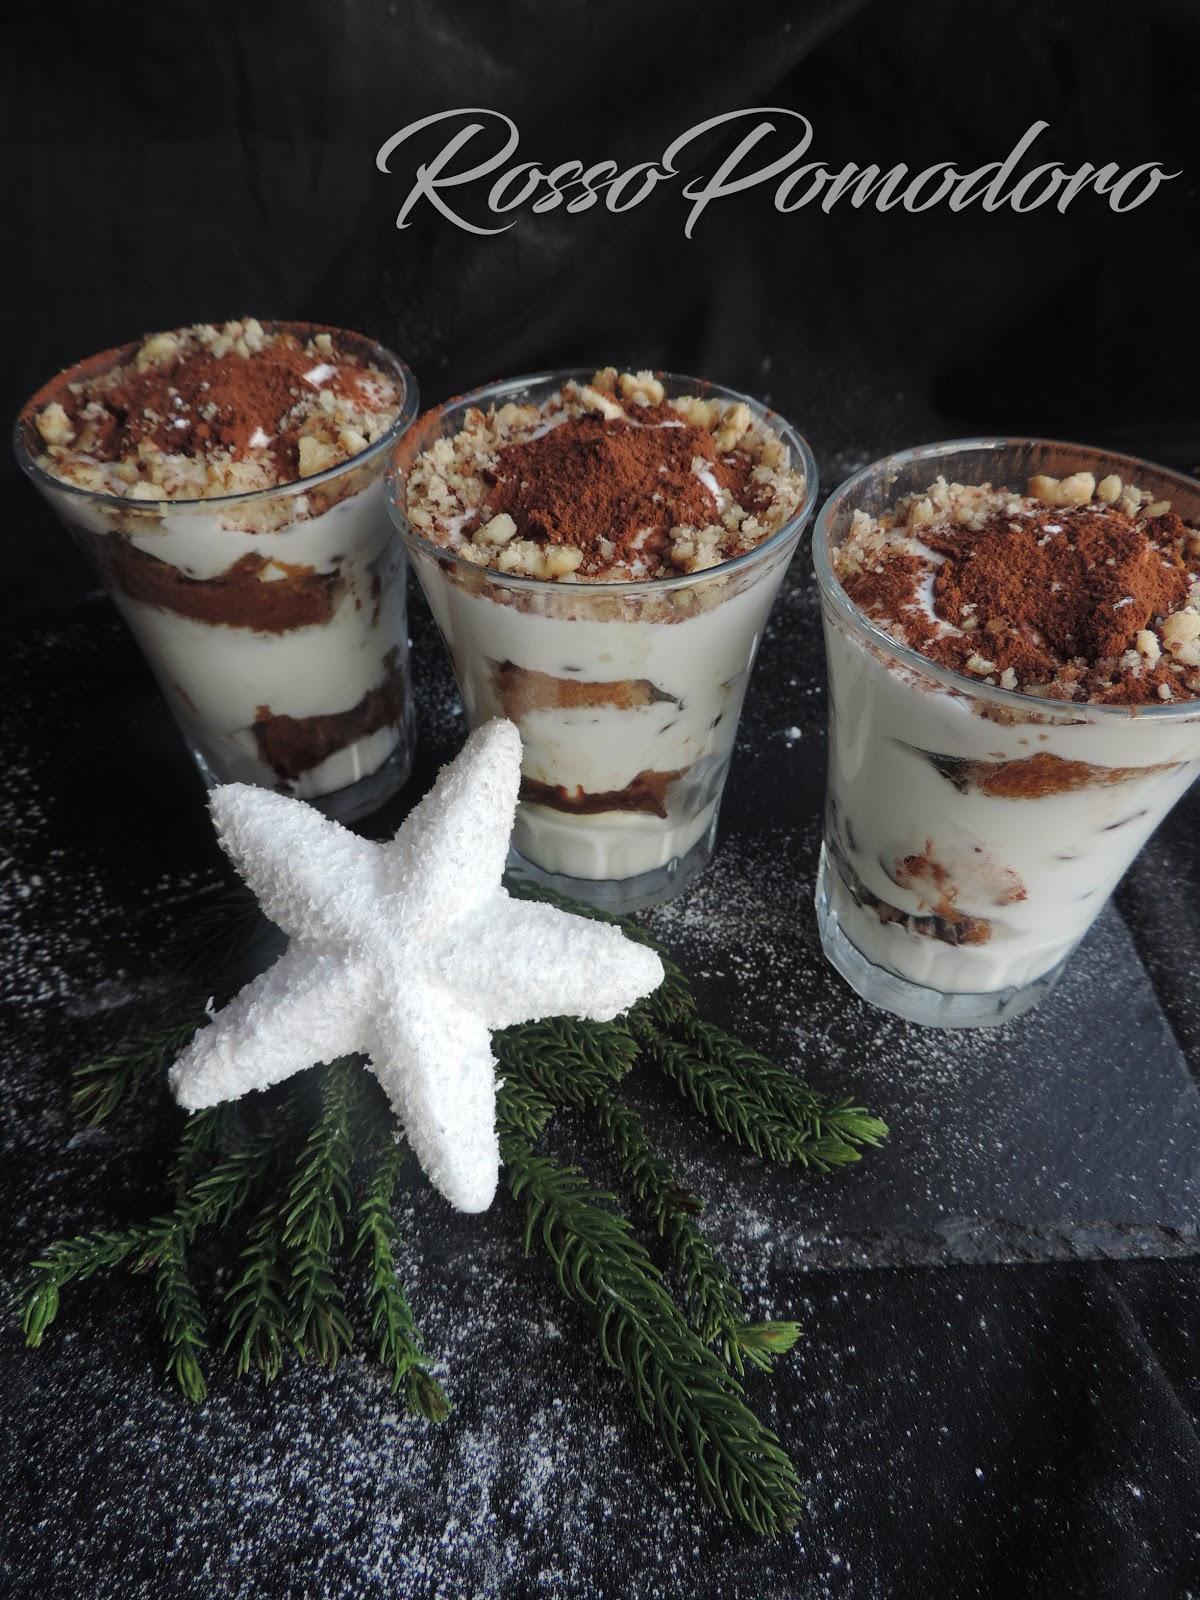 Ricetta Tiramisu Allo Yogurt Greco.Bicchierini Di Tiramisu Con Yogurt Greco E Panna Freddi Dolciaria 4 5